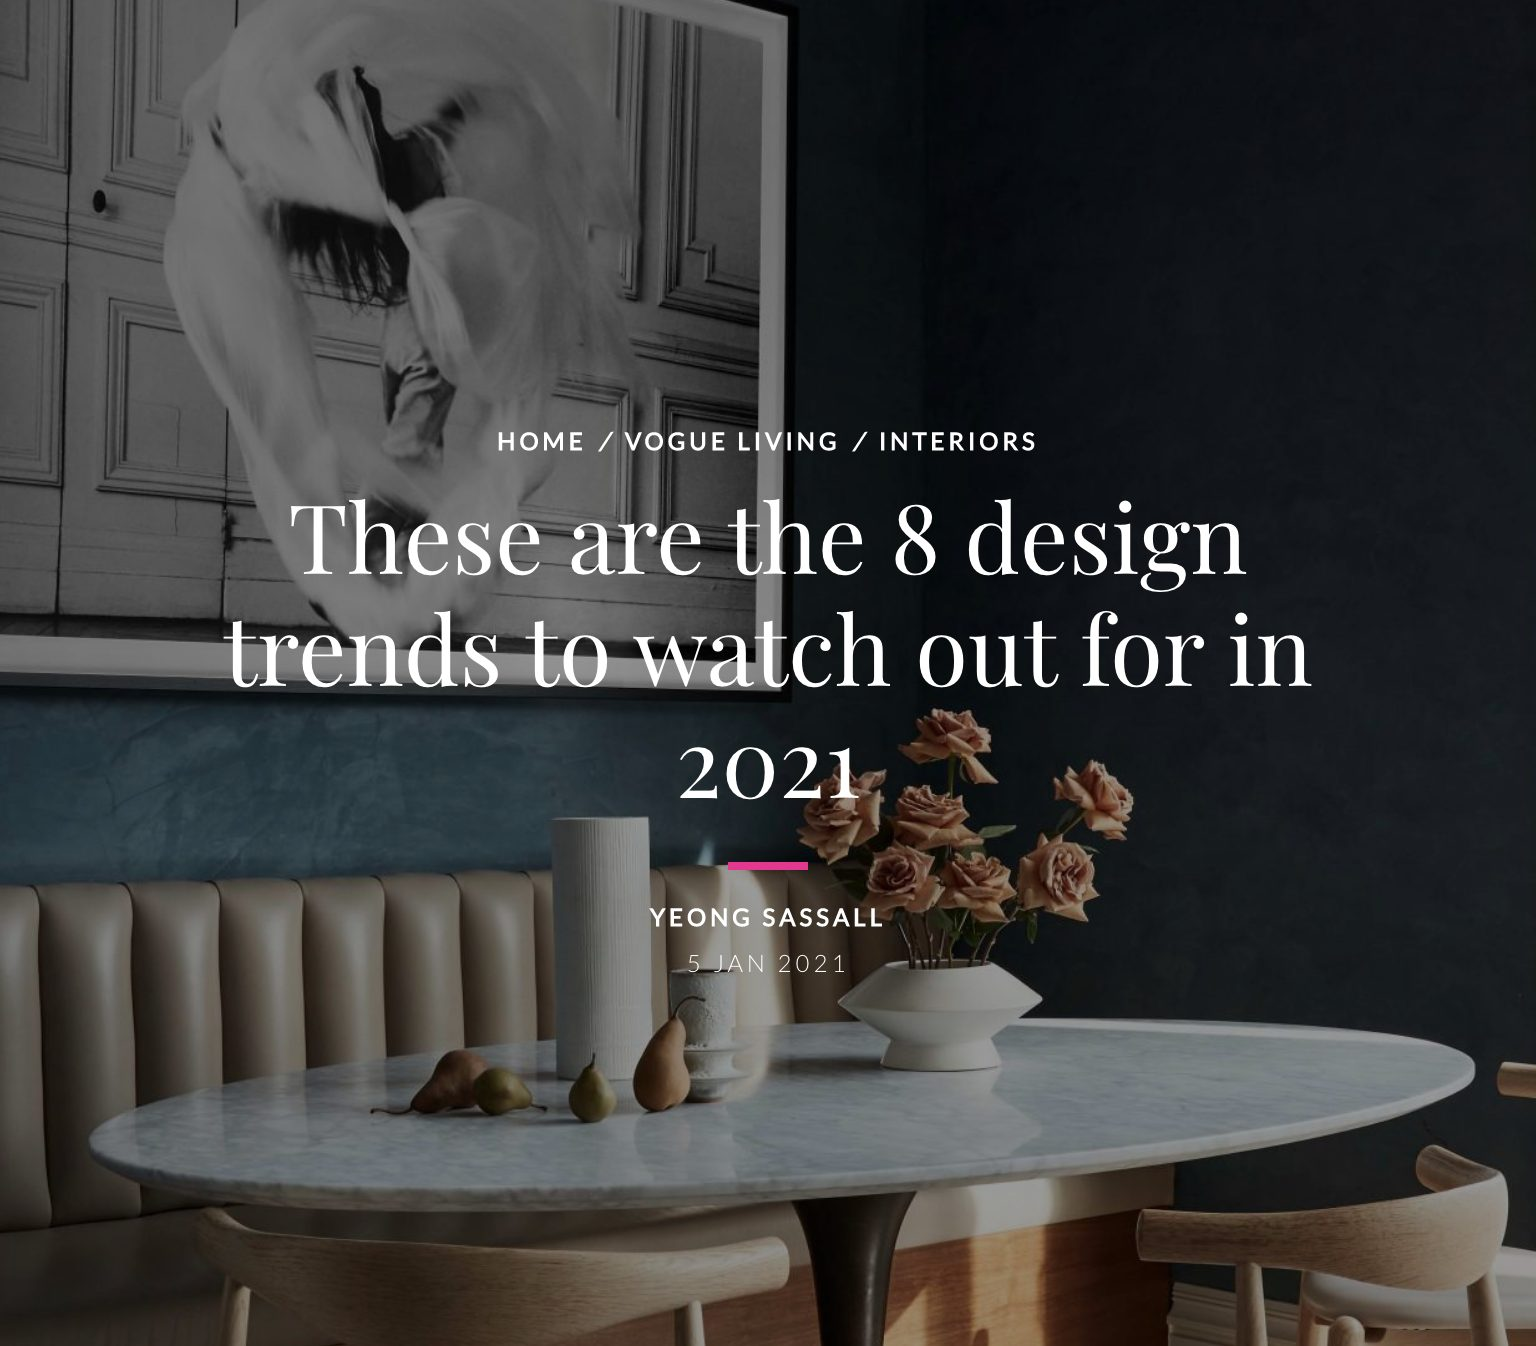 Architect Adam Meshberg on Design Trends in Vogue Living